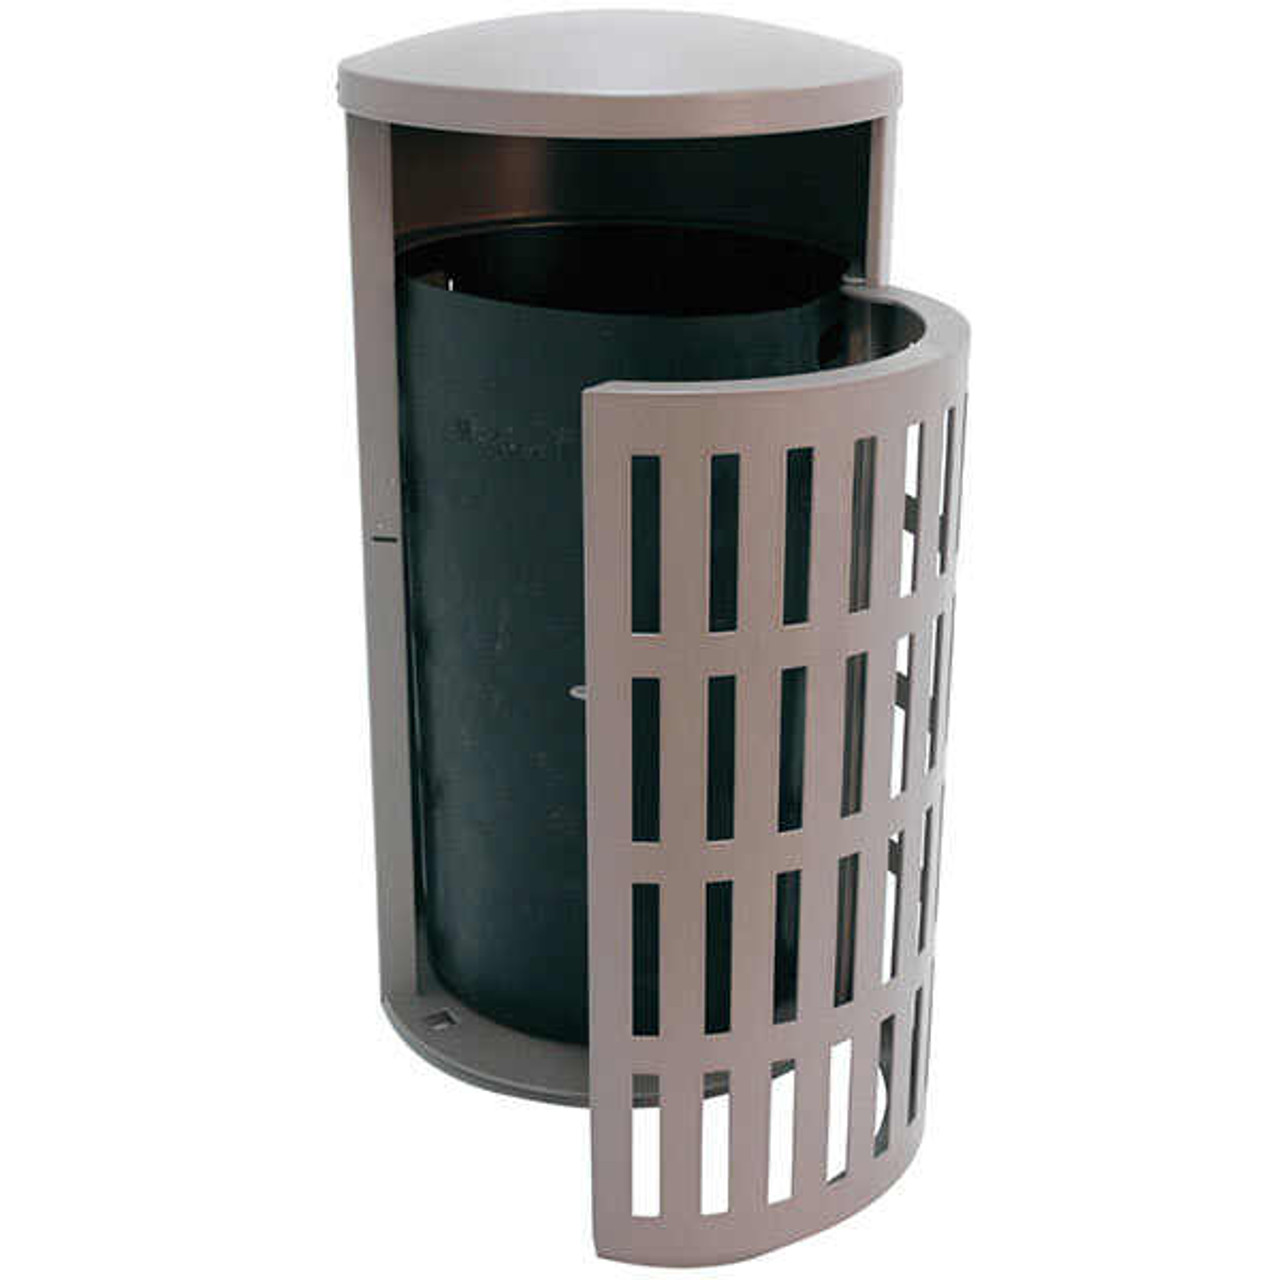 41 Gallon Metal Armor Outdoor Waste Receptacle MF3302 with Side Door & Concrete Base